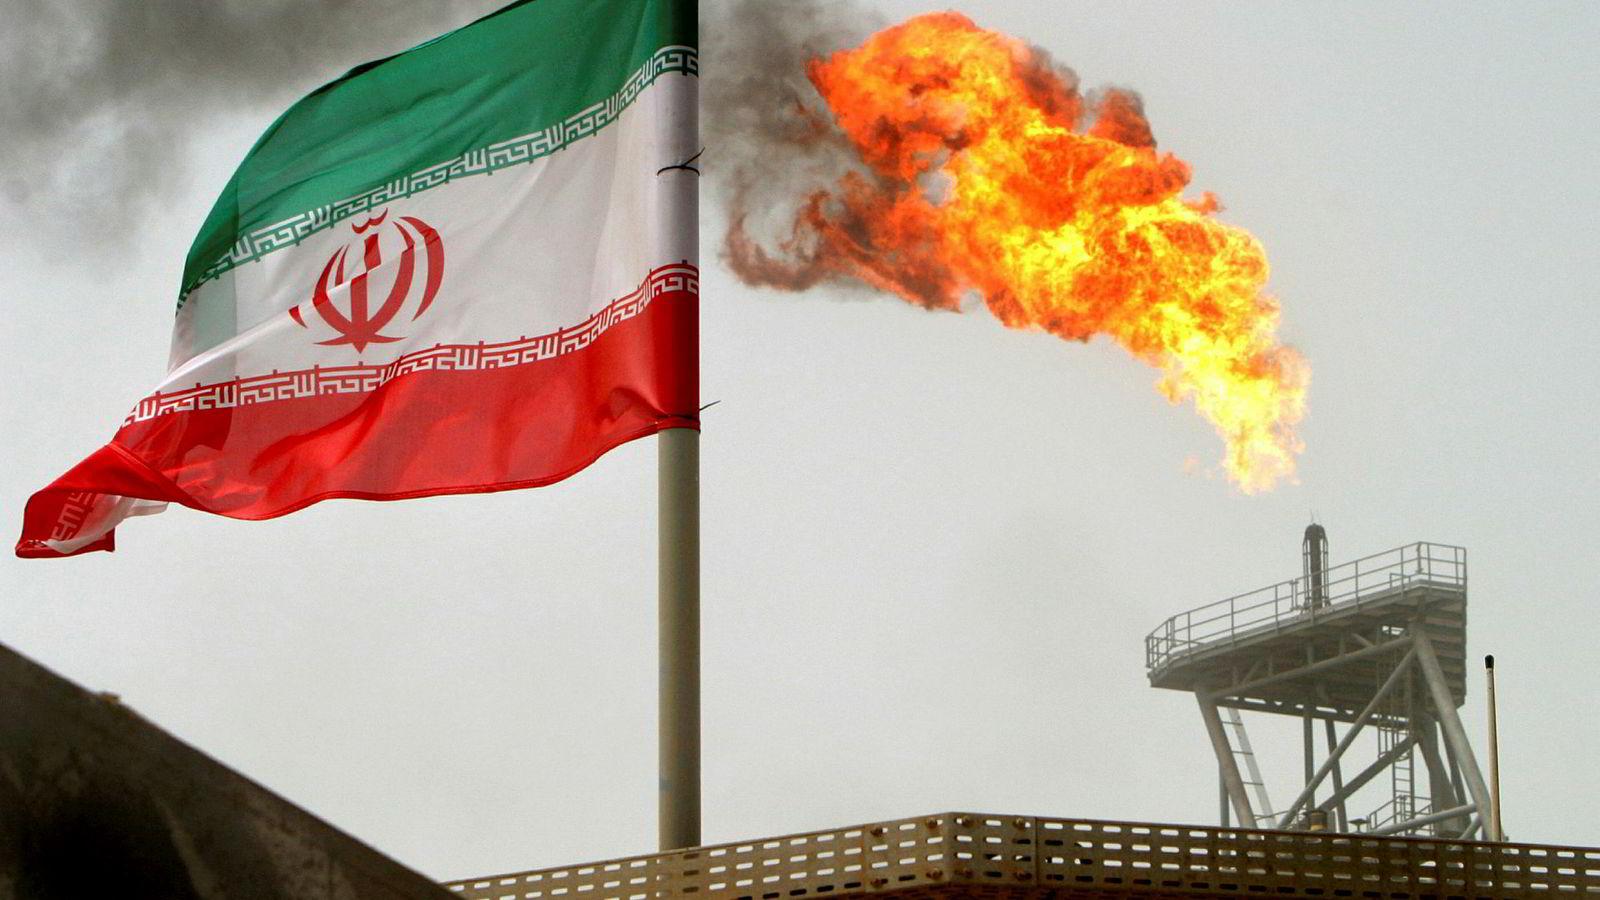 Oljeprisen stiger halvannen prosent mandag etter at Donald Trump truer med «slutten på Iran». Her ses en gassflamme på en oljeplattform på Soroush-feltet, offshore Iran.